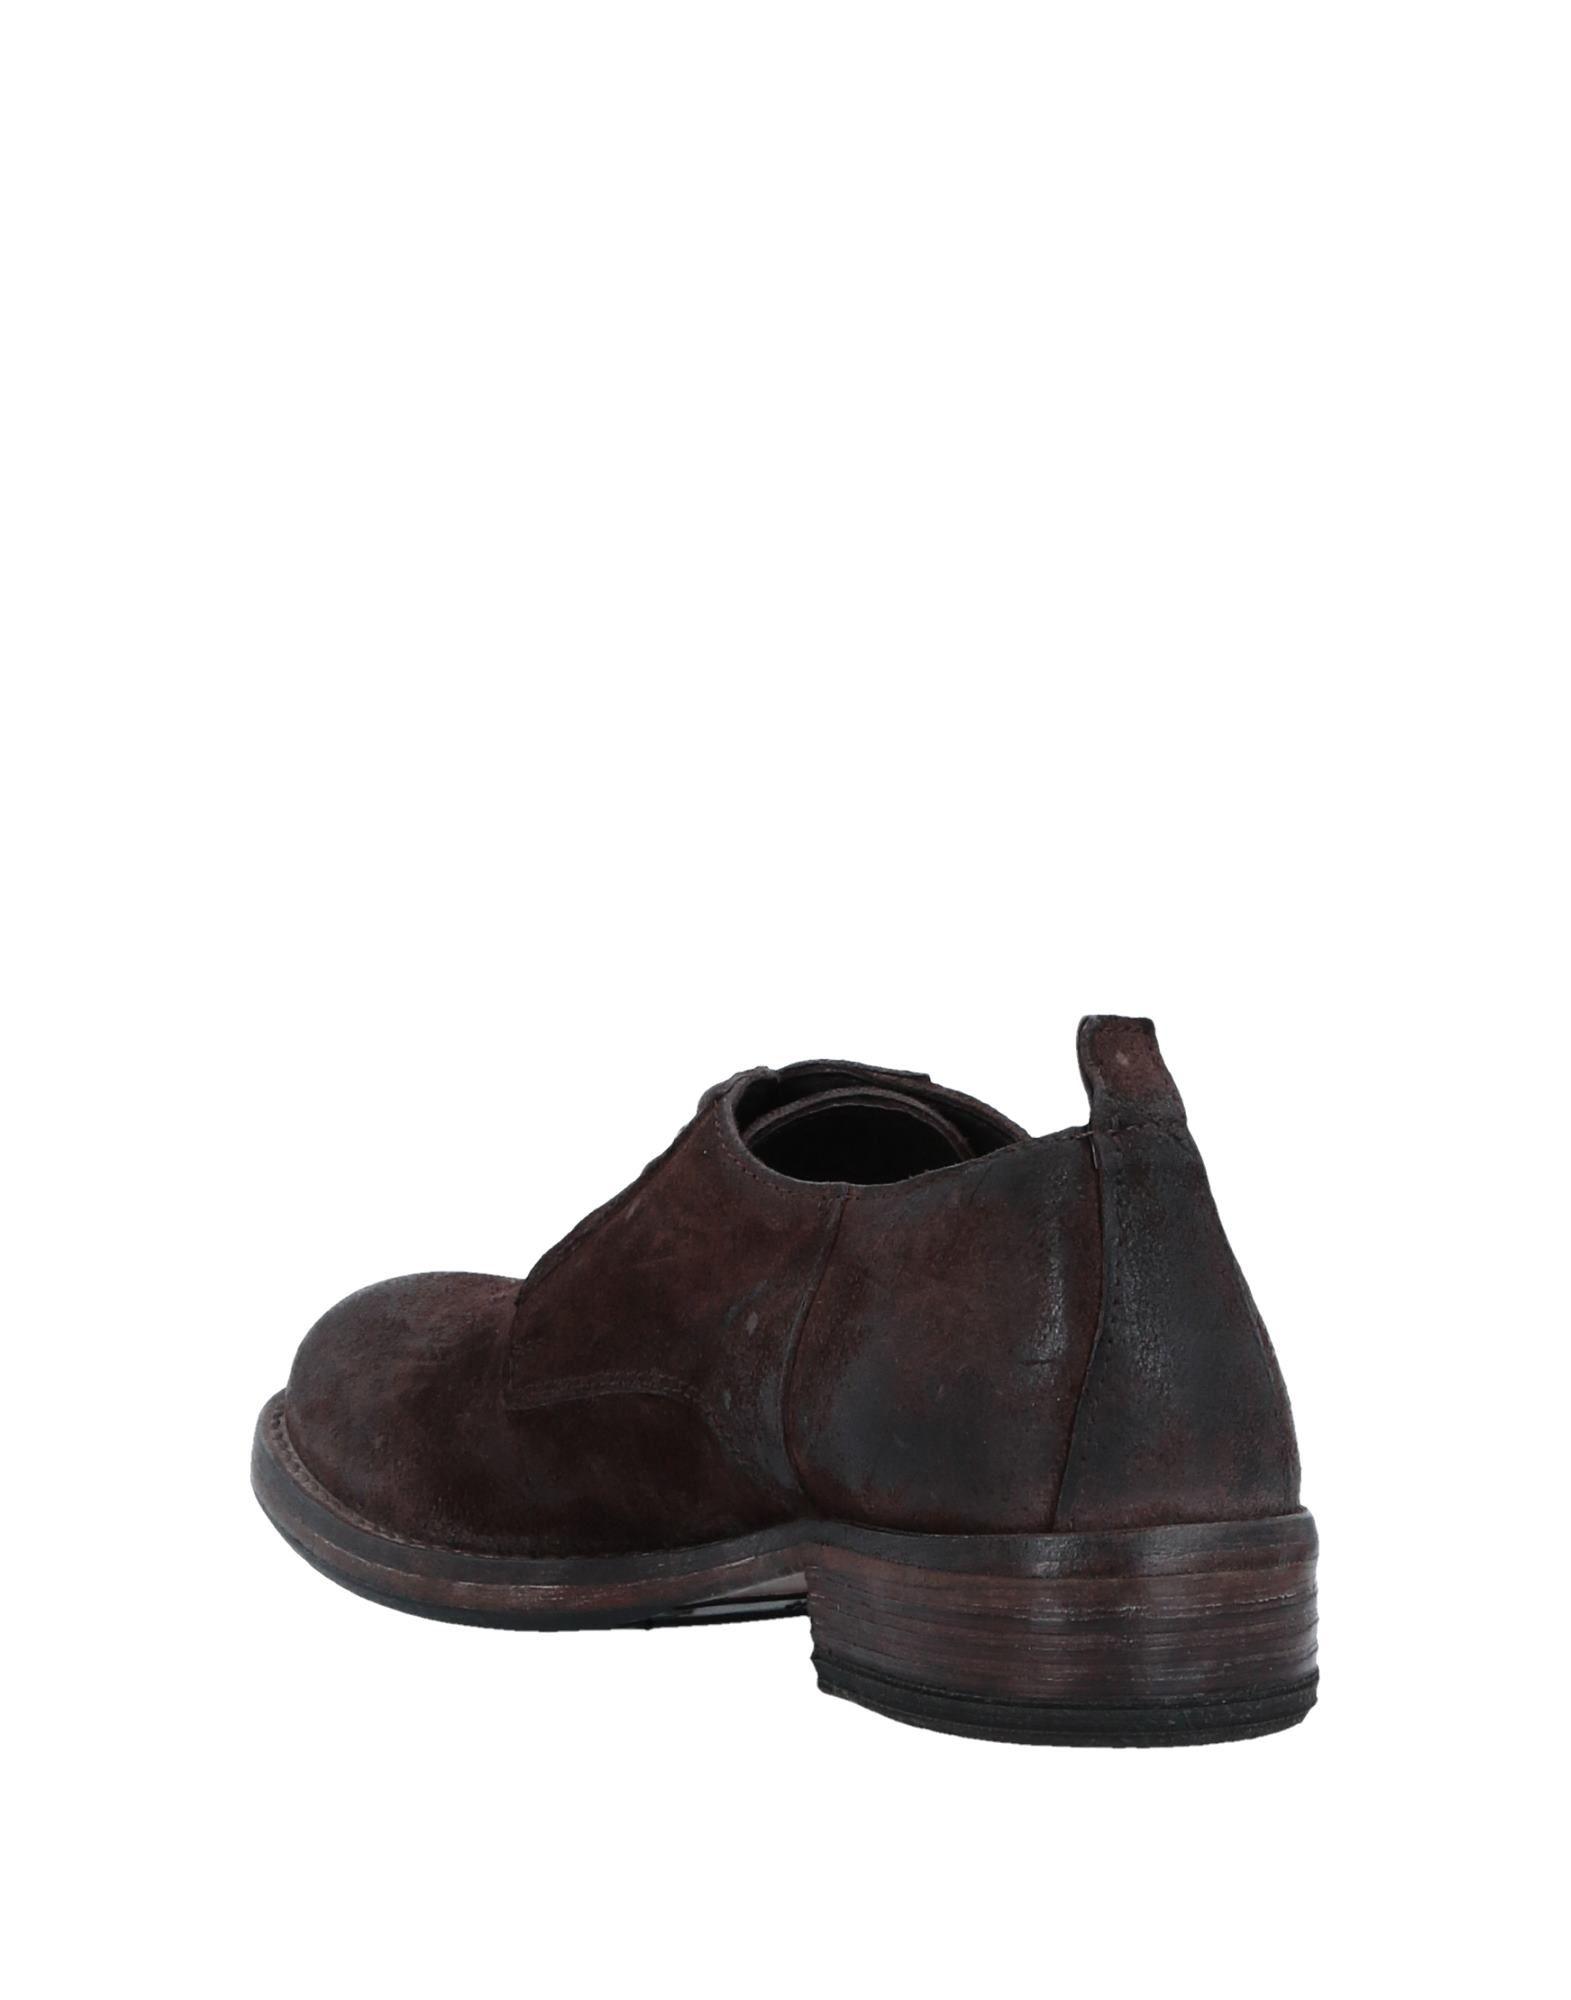 Stilvolle billige Schuhe 11516658JW Moma Schnürschuhe Damen  11516658JW Schuhe 5018e9